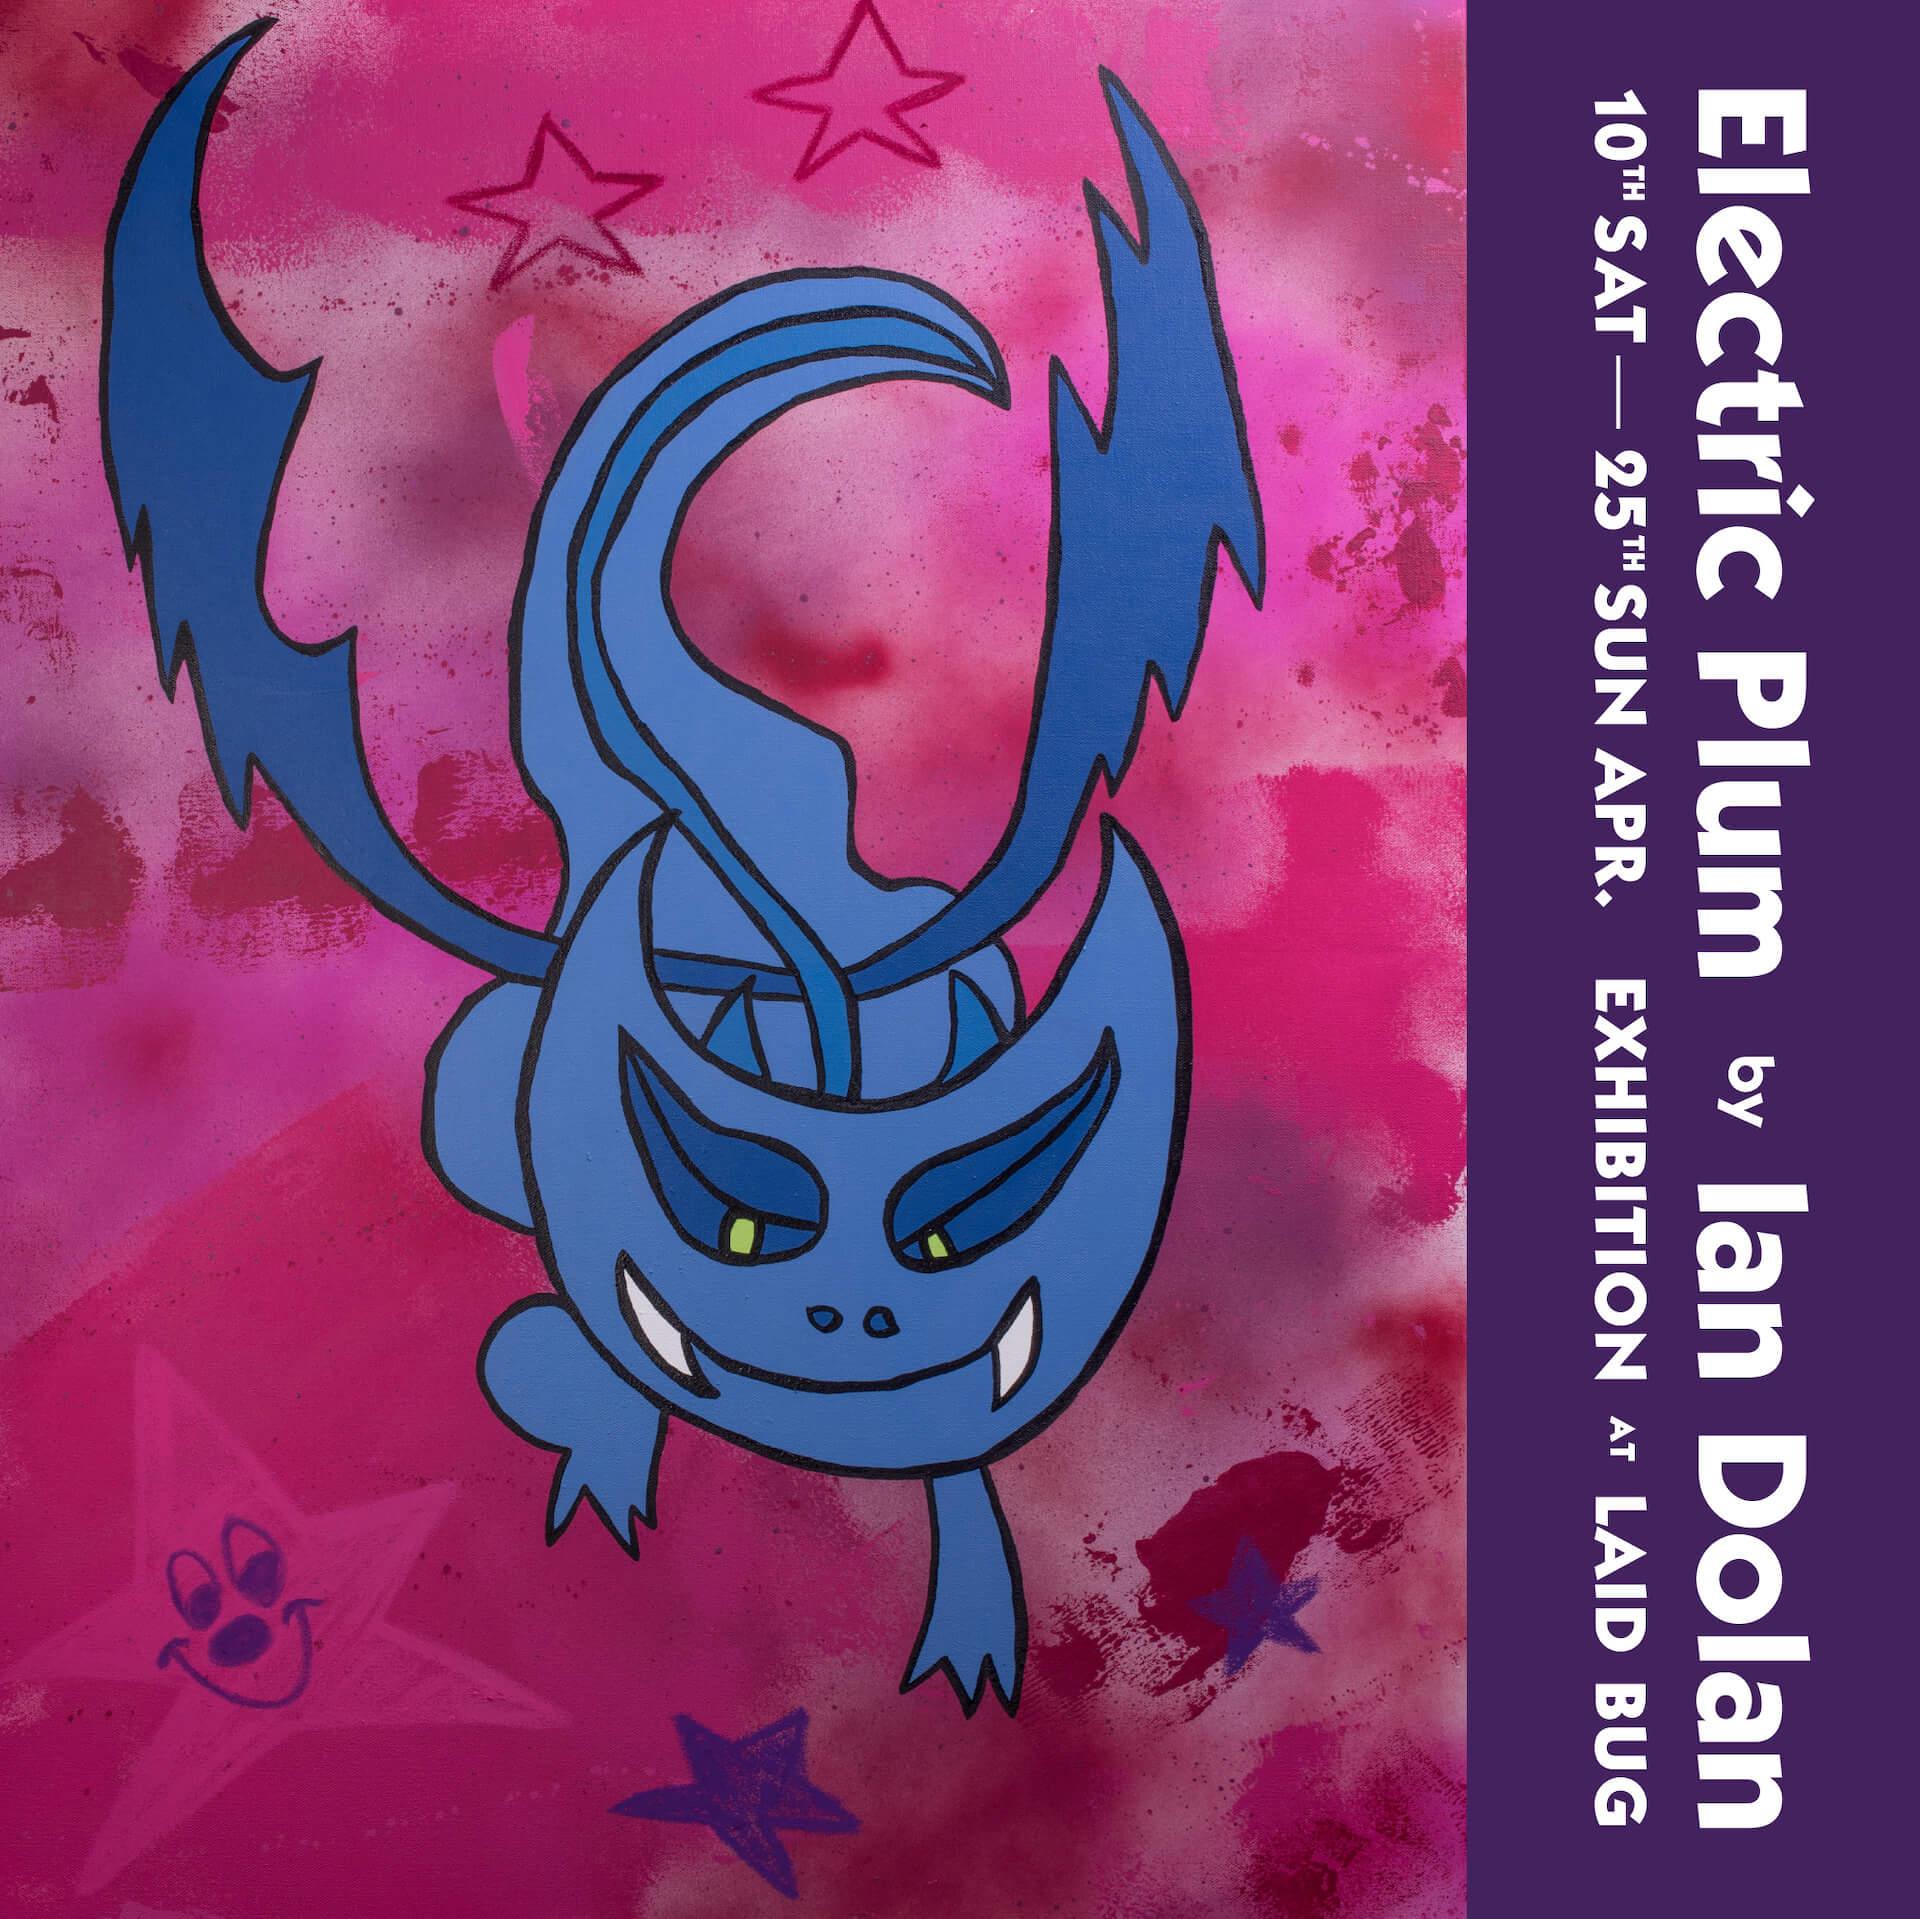 Day By Dayのフロントマン、Ian Dolanによる個展<Electric Plum>がLAID BAGにて今週開催! art210406_iandolan_4